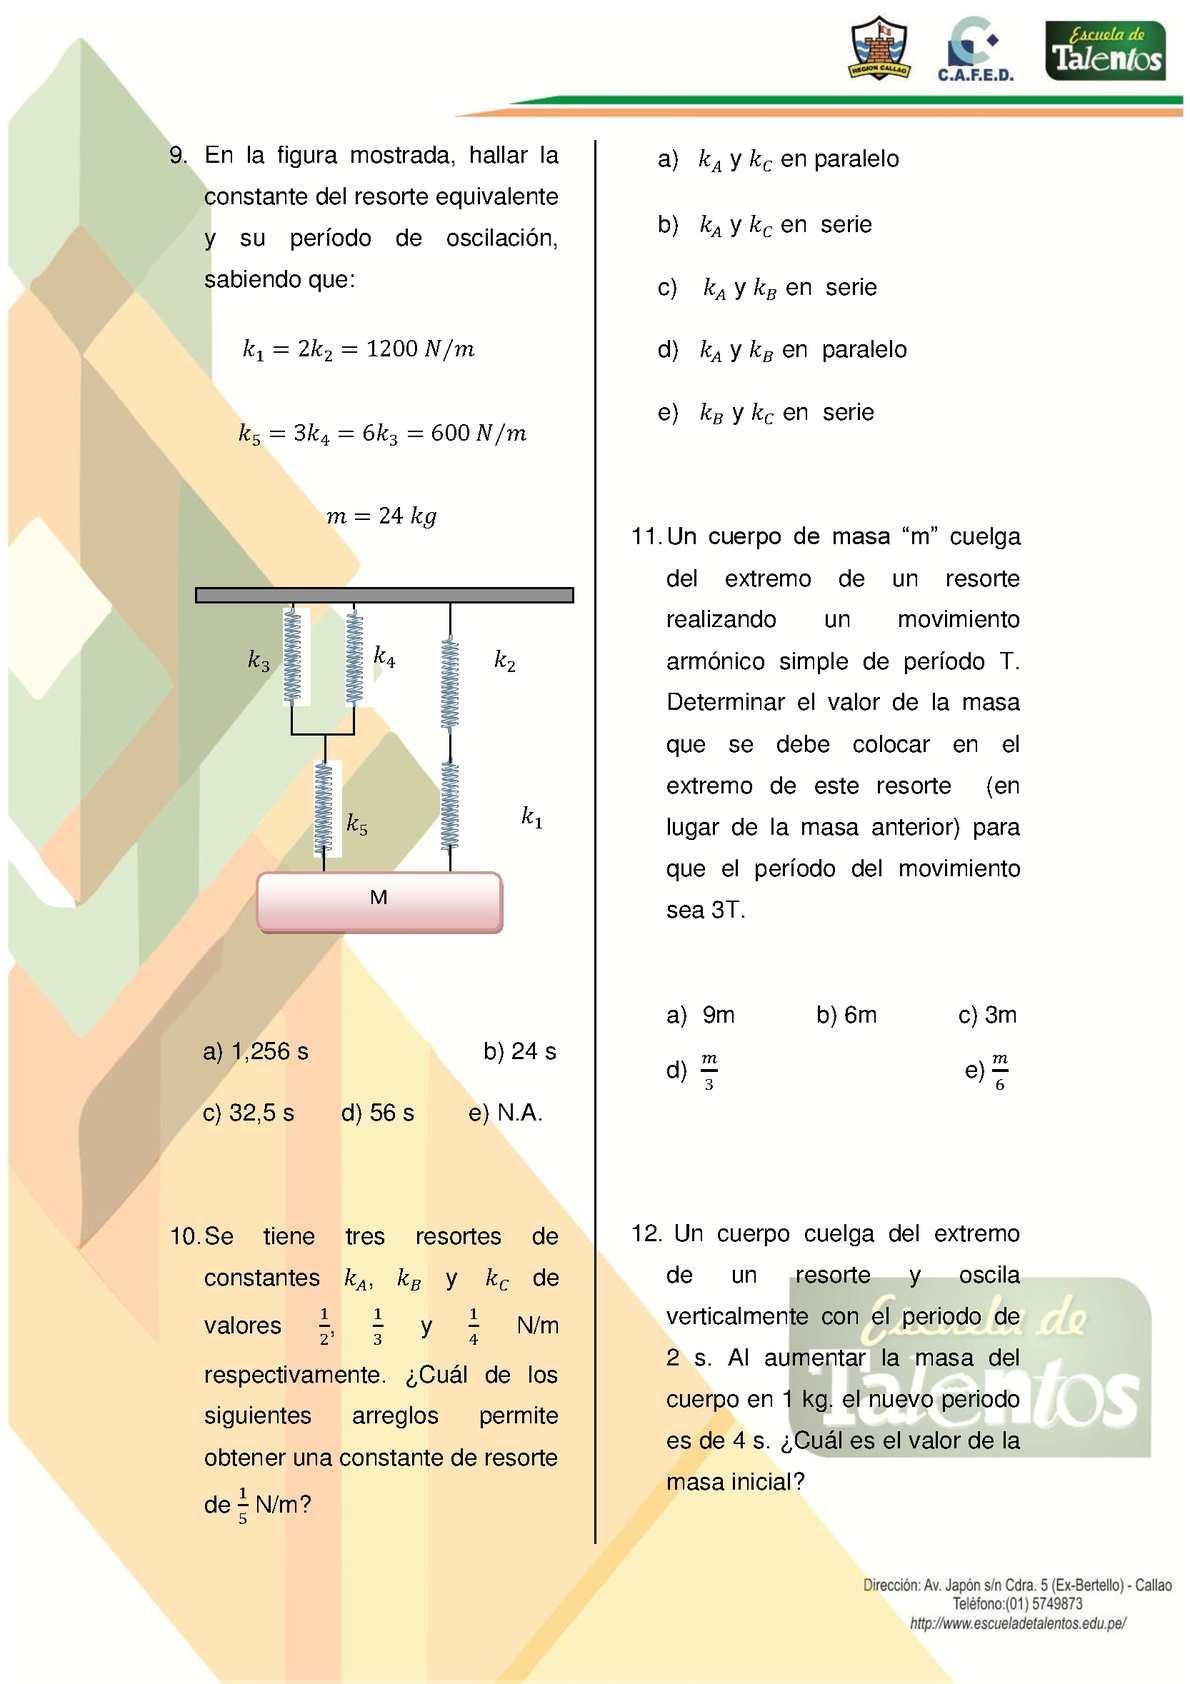 EJMAS - CALAMEO Downloader